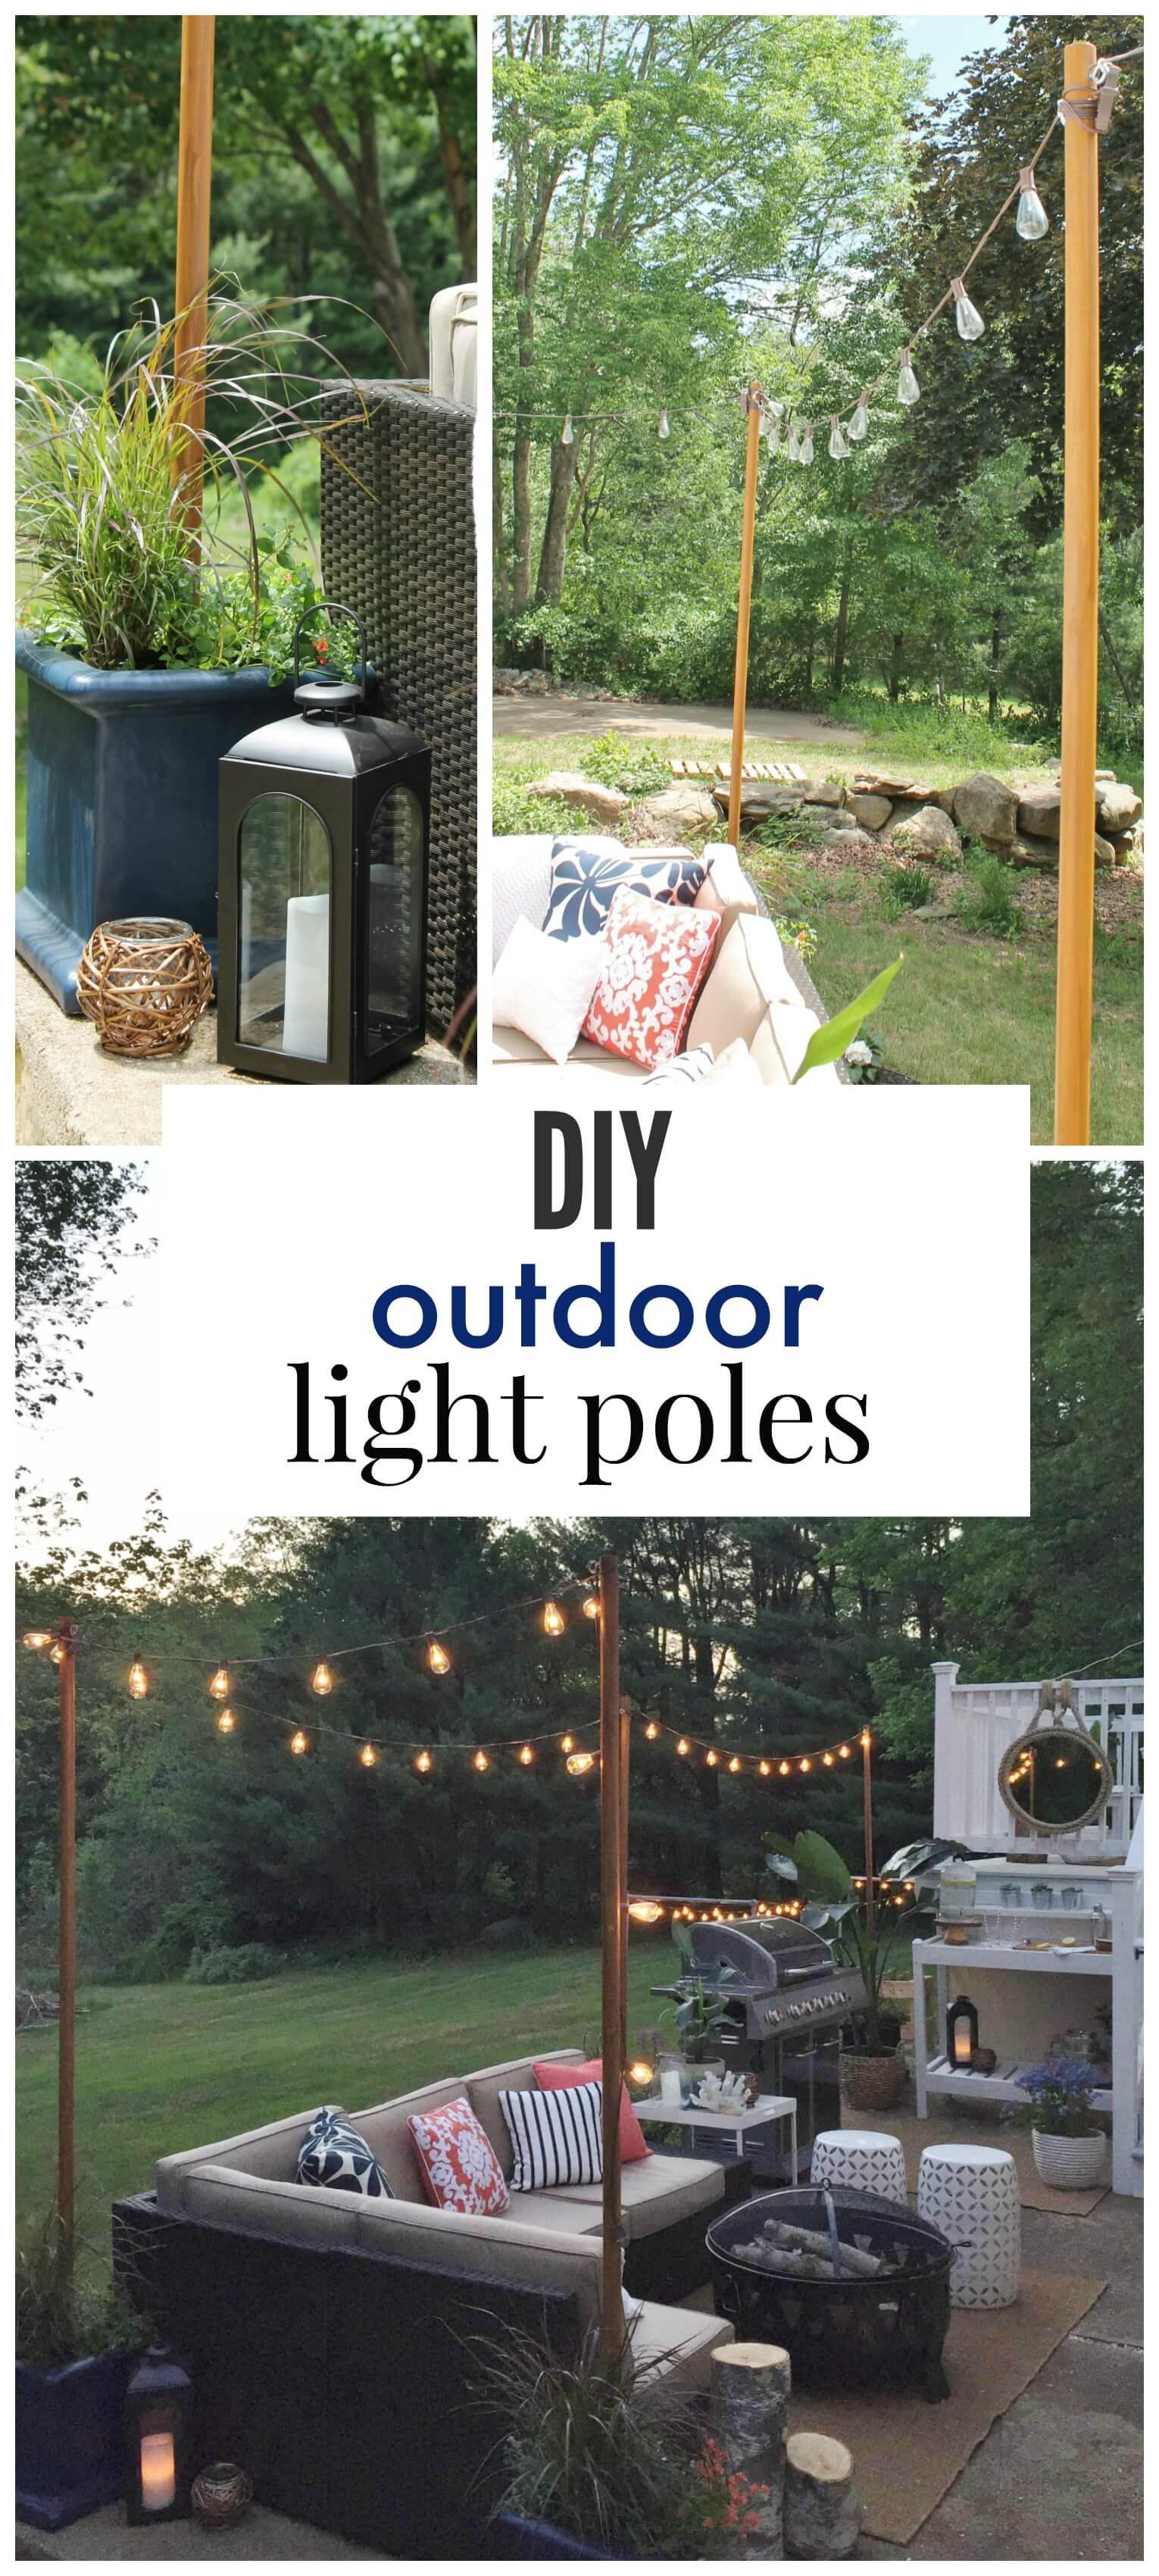 Backyard Projects: 15 Amazing DIY Outdoor Decor Ideas ... on Diy Back Patio Ideas id=14546